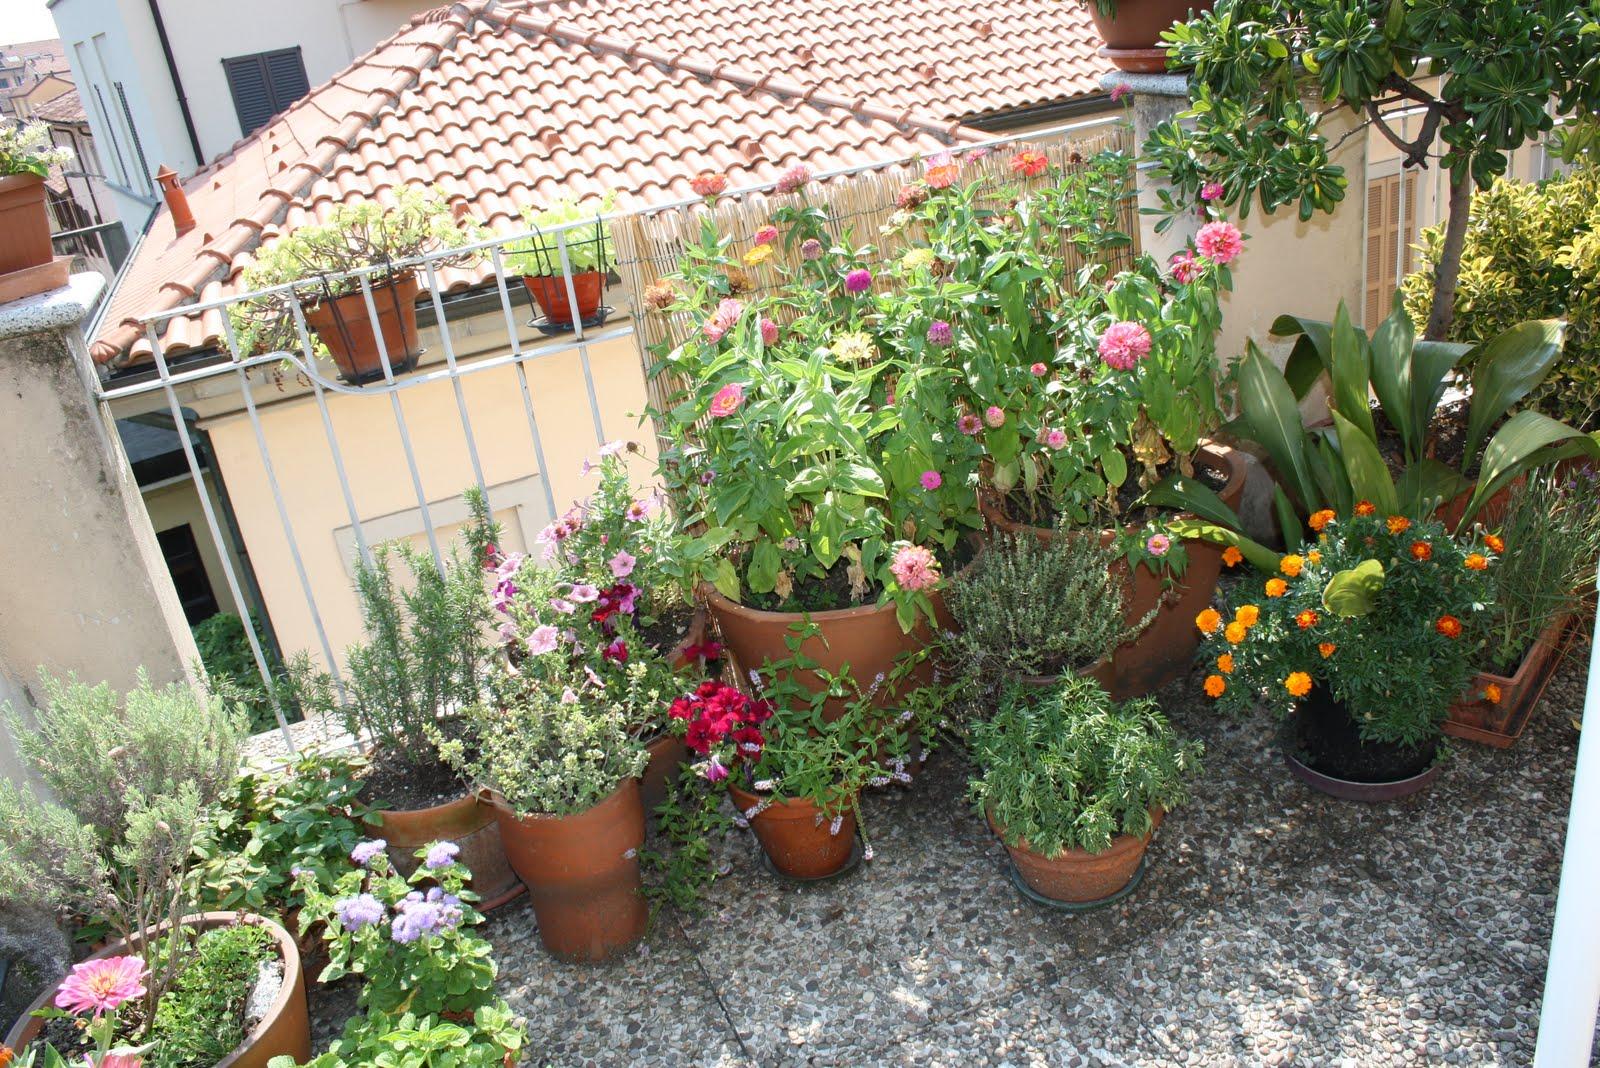 terrazzi fioriti